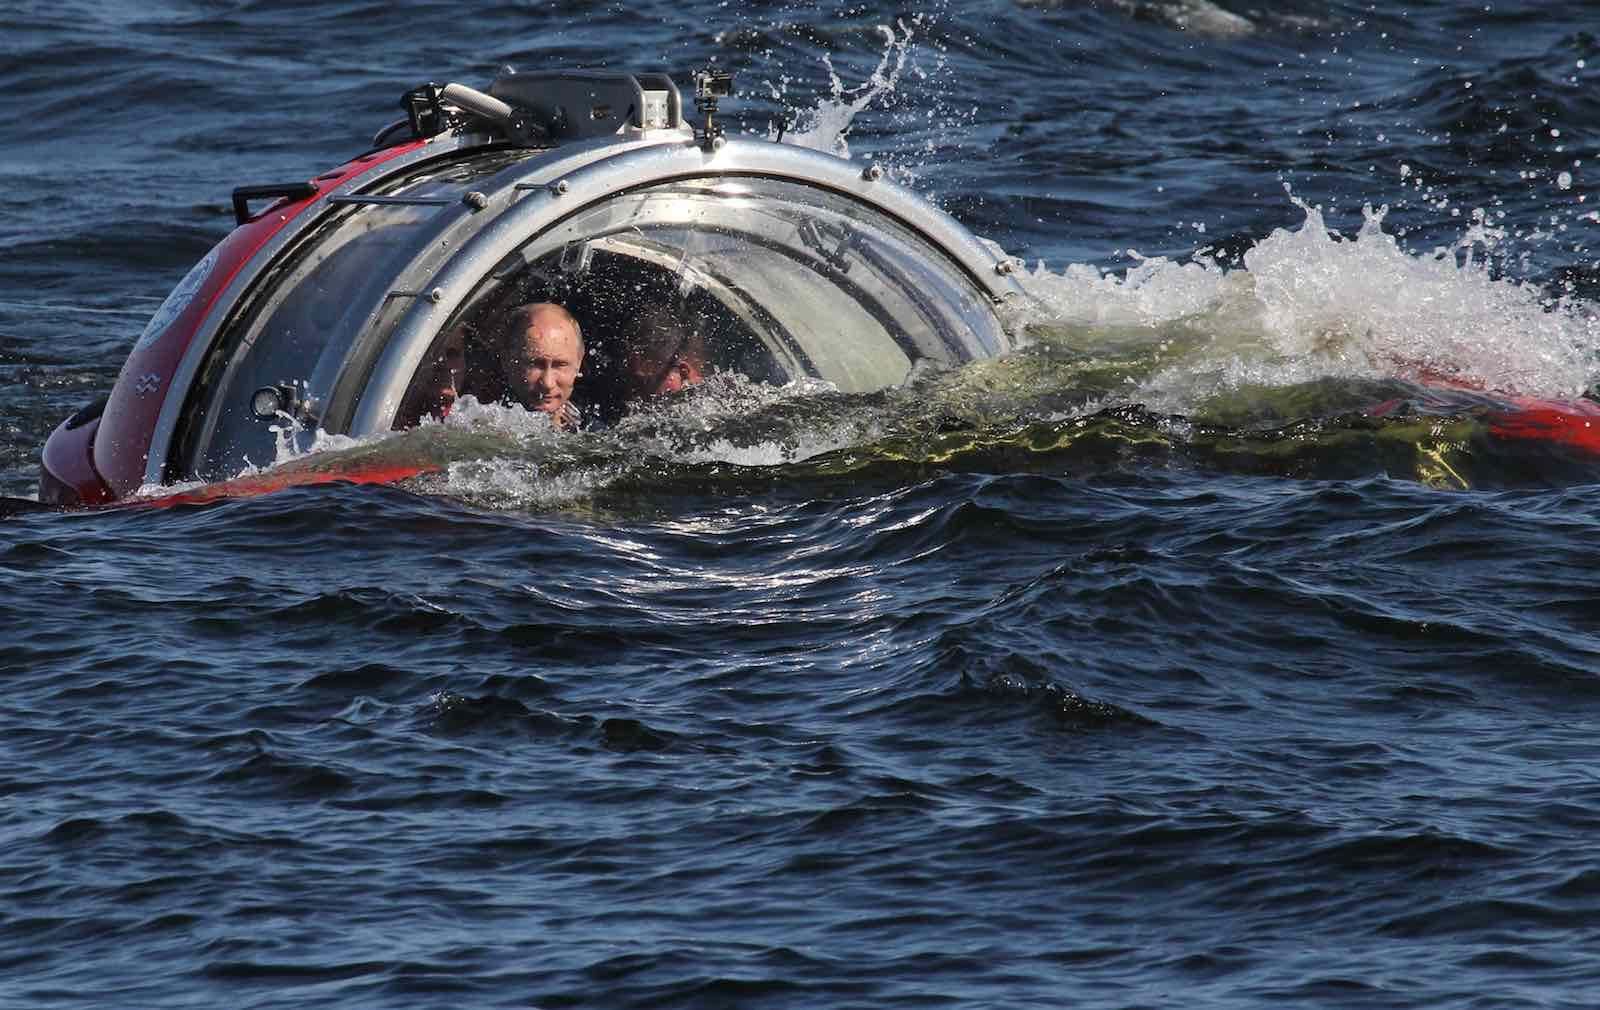 Russian President Vladimir Putin in a Baltic Sea submersible in 2013 near Gotland Island, Russia (Photo: Sasha Mordovets/Getty)